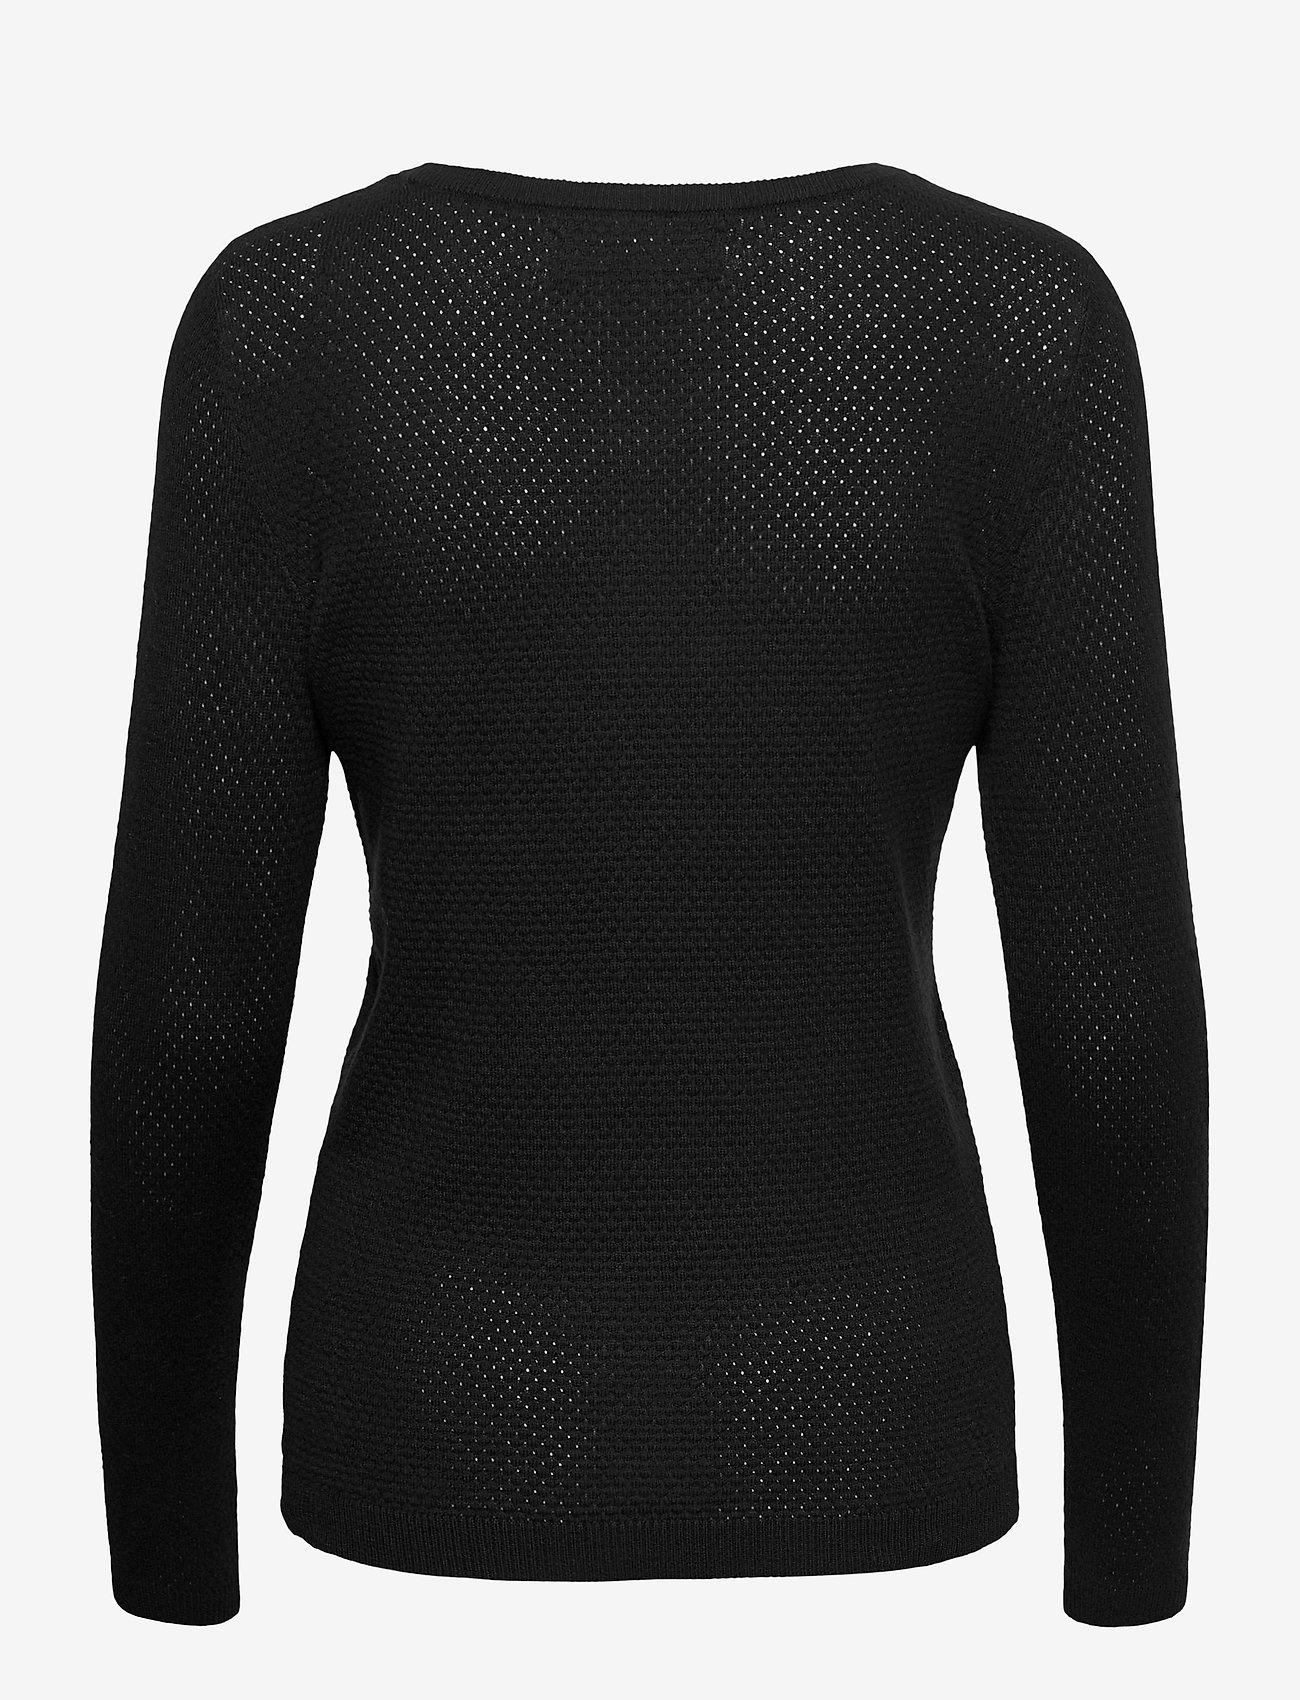 Vero Moda - VMMINNIECARE LS O-NECK BLOUSE GA - tröjor - black - 1